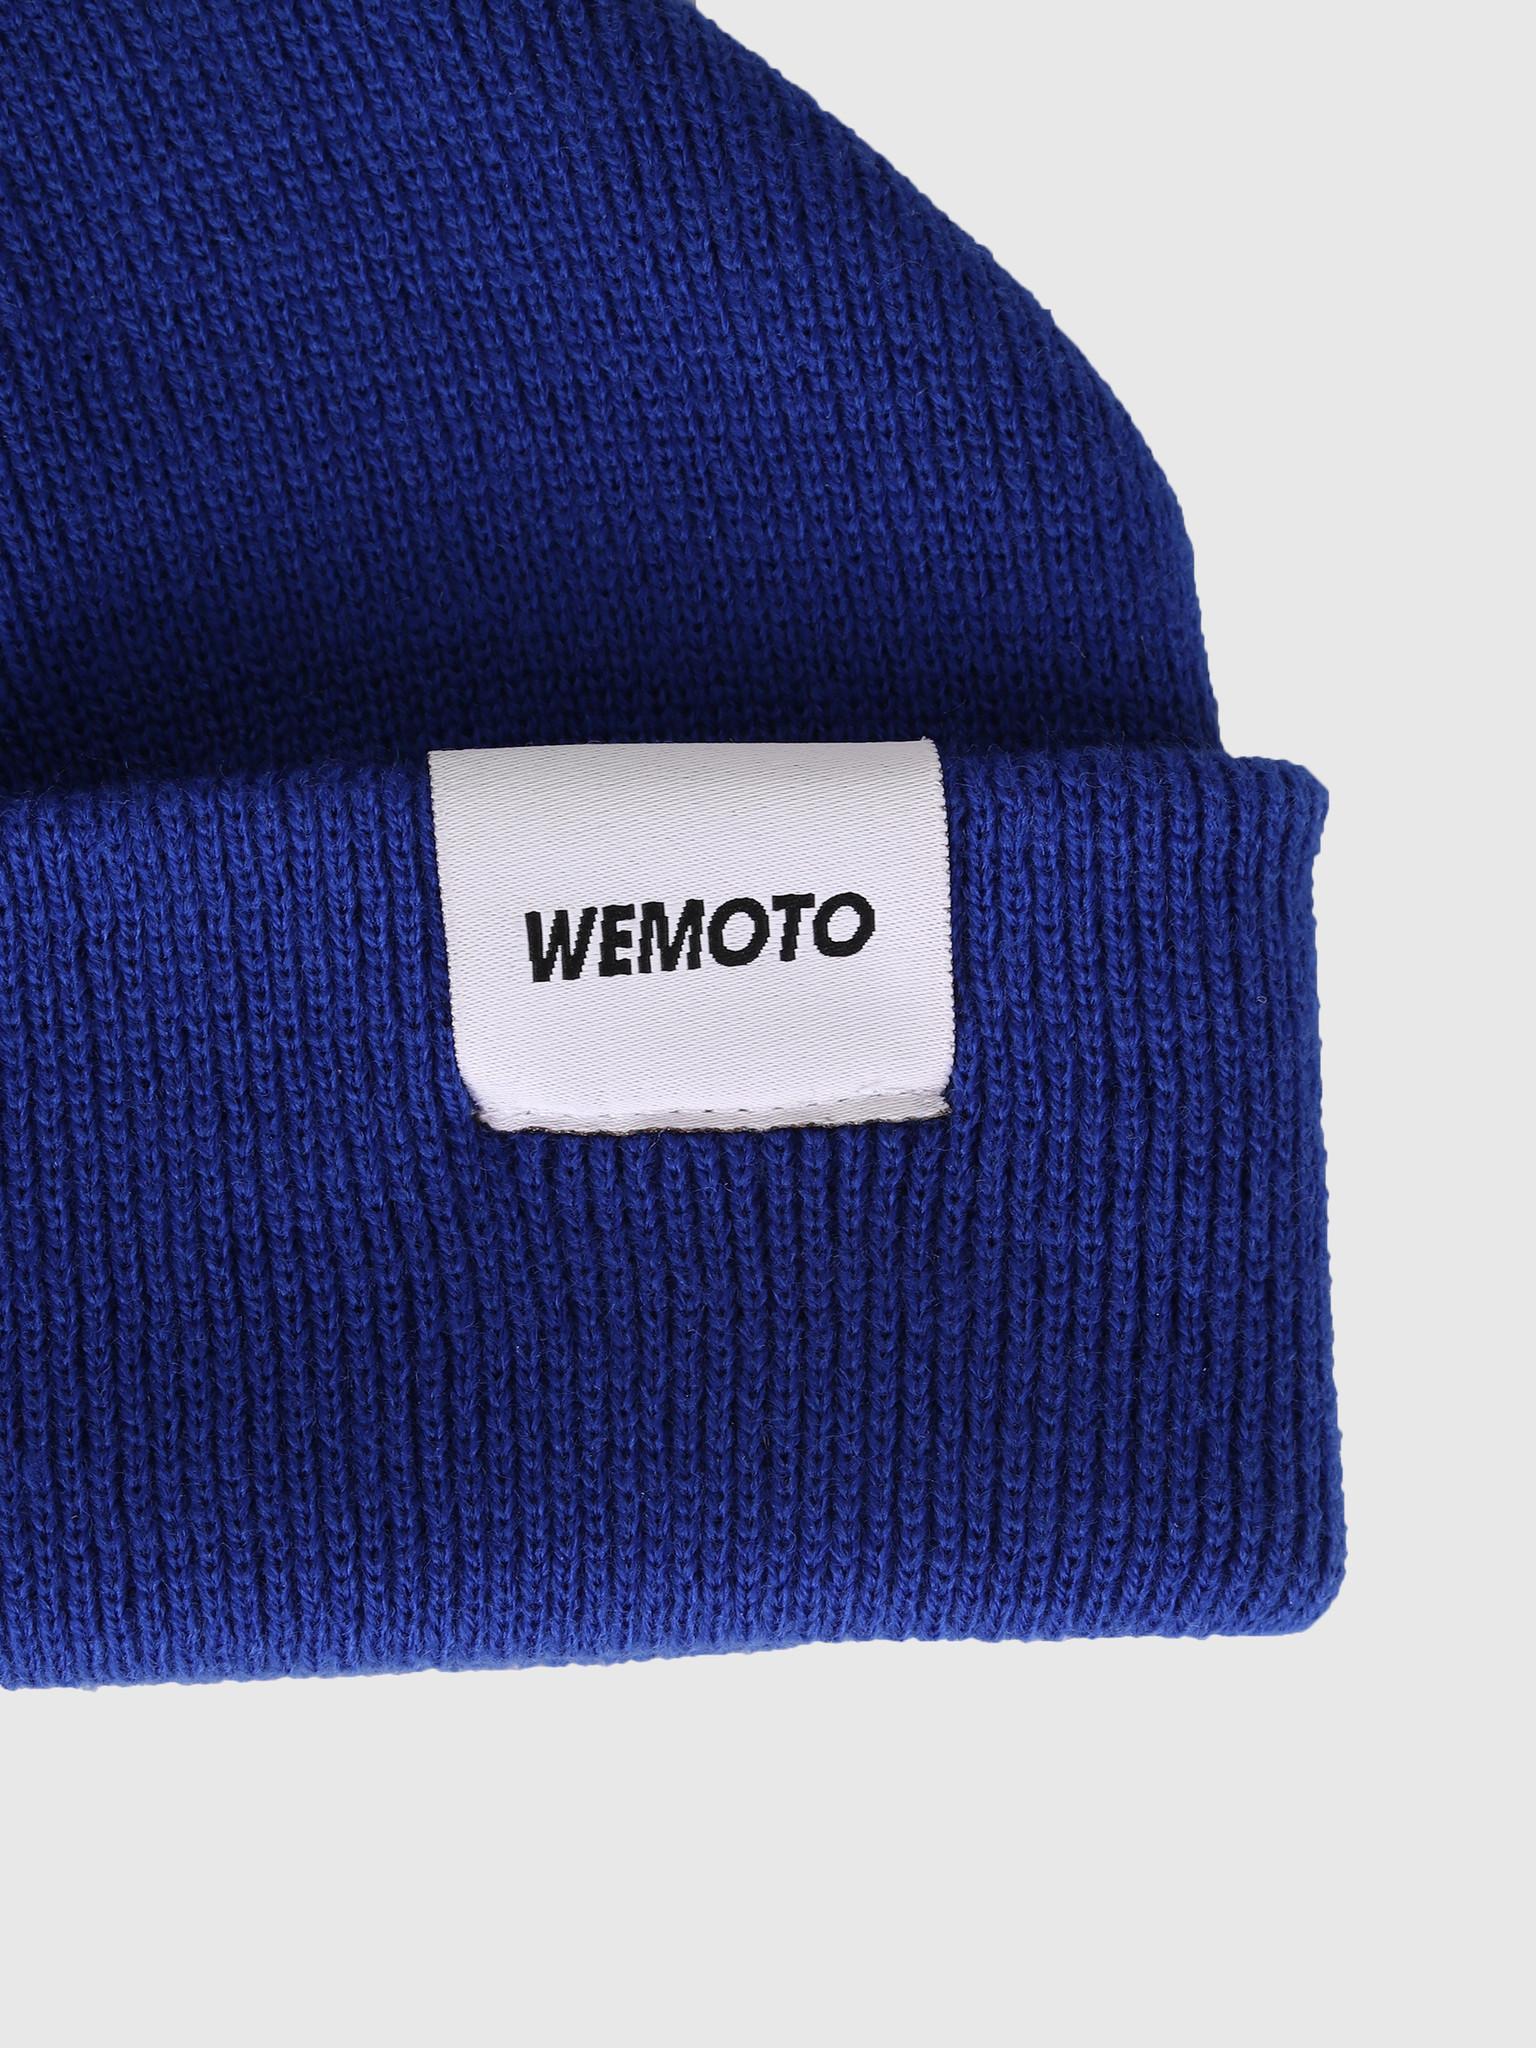 Wemoto Wemoto Shiloh Beanie Royal Blue 143.810-415